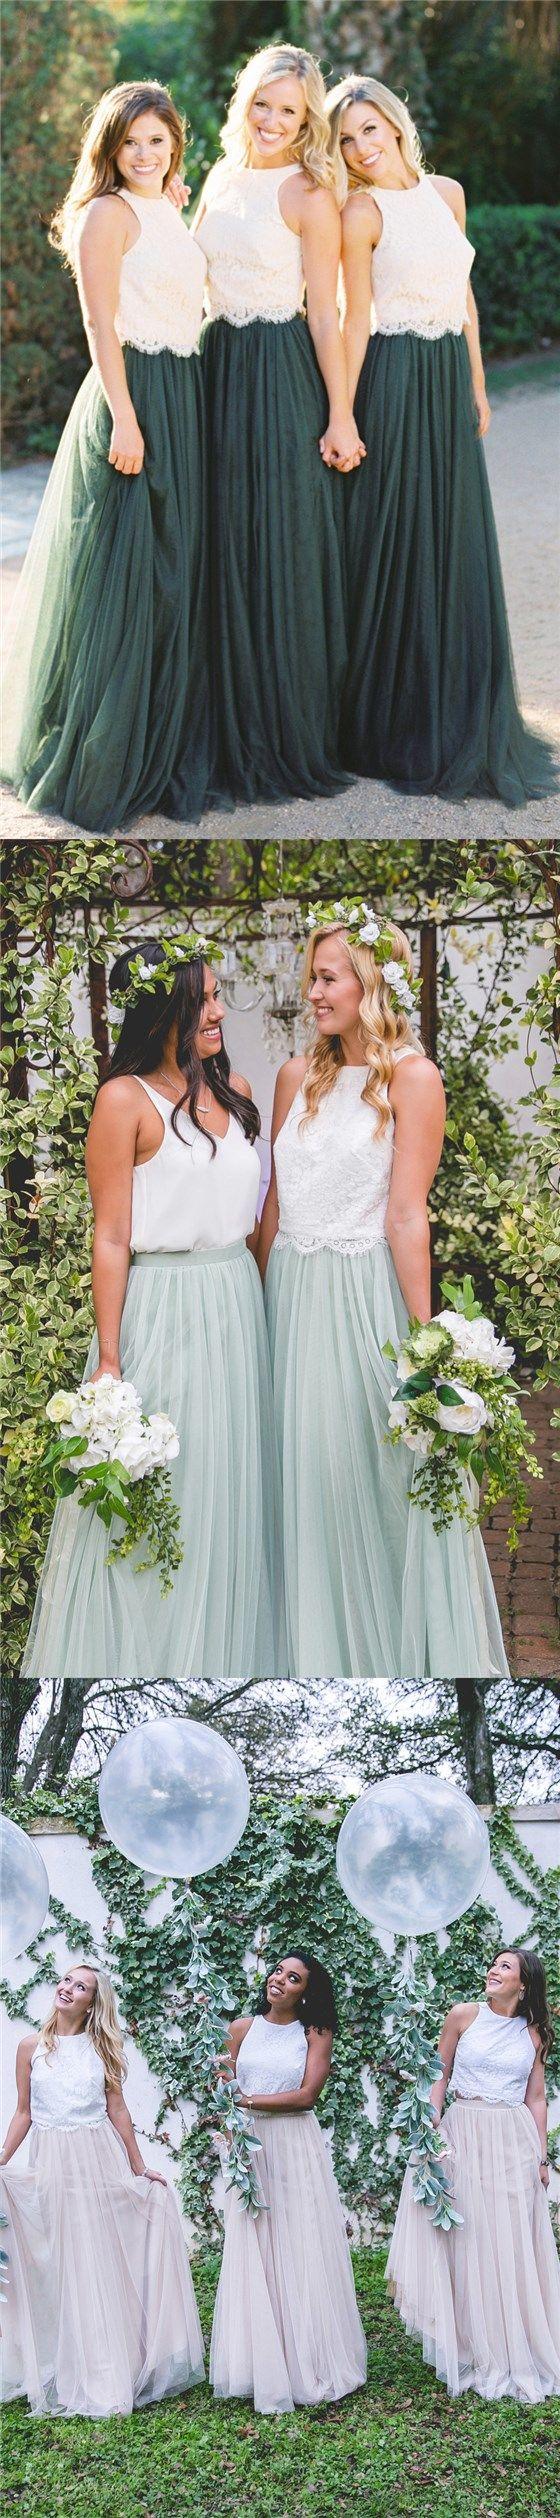 146 best Bridesmaid Dress images on Pinterest | Flower girls ...